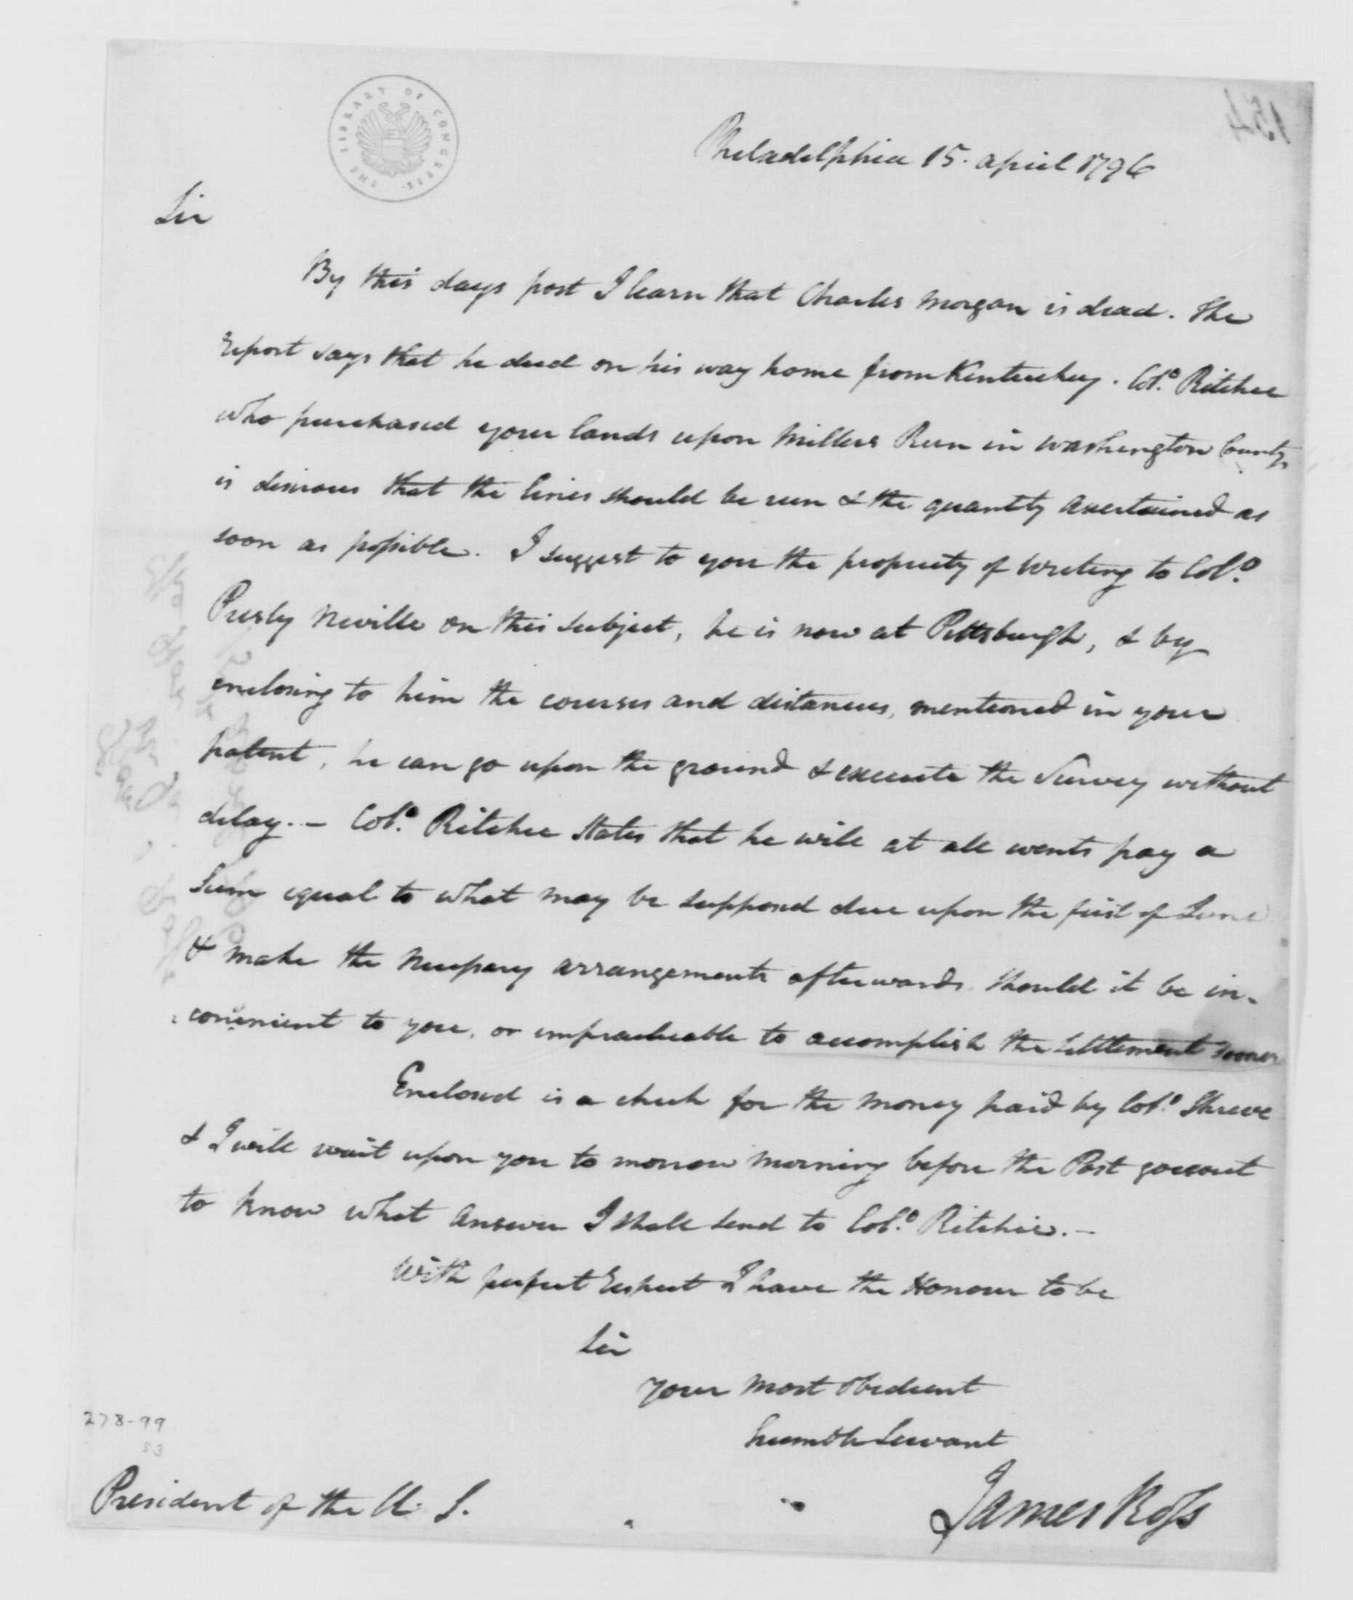 George Washington Papers, Series 4, General Correspondence: James Ross to George Washington, April 15, 1796